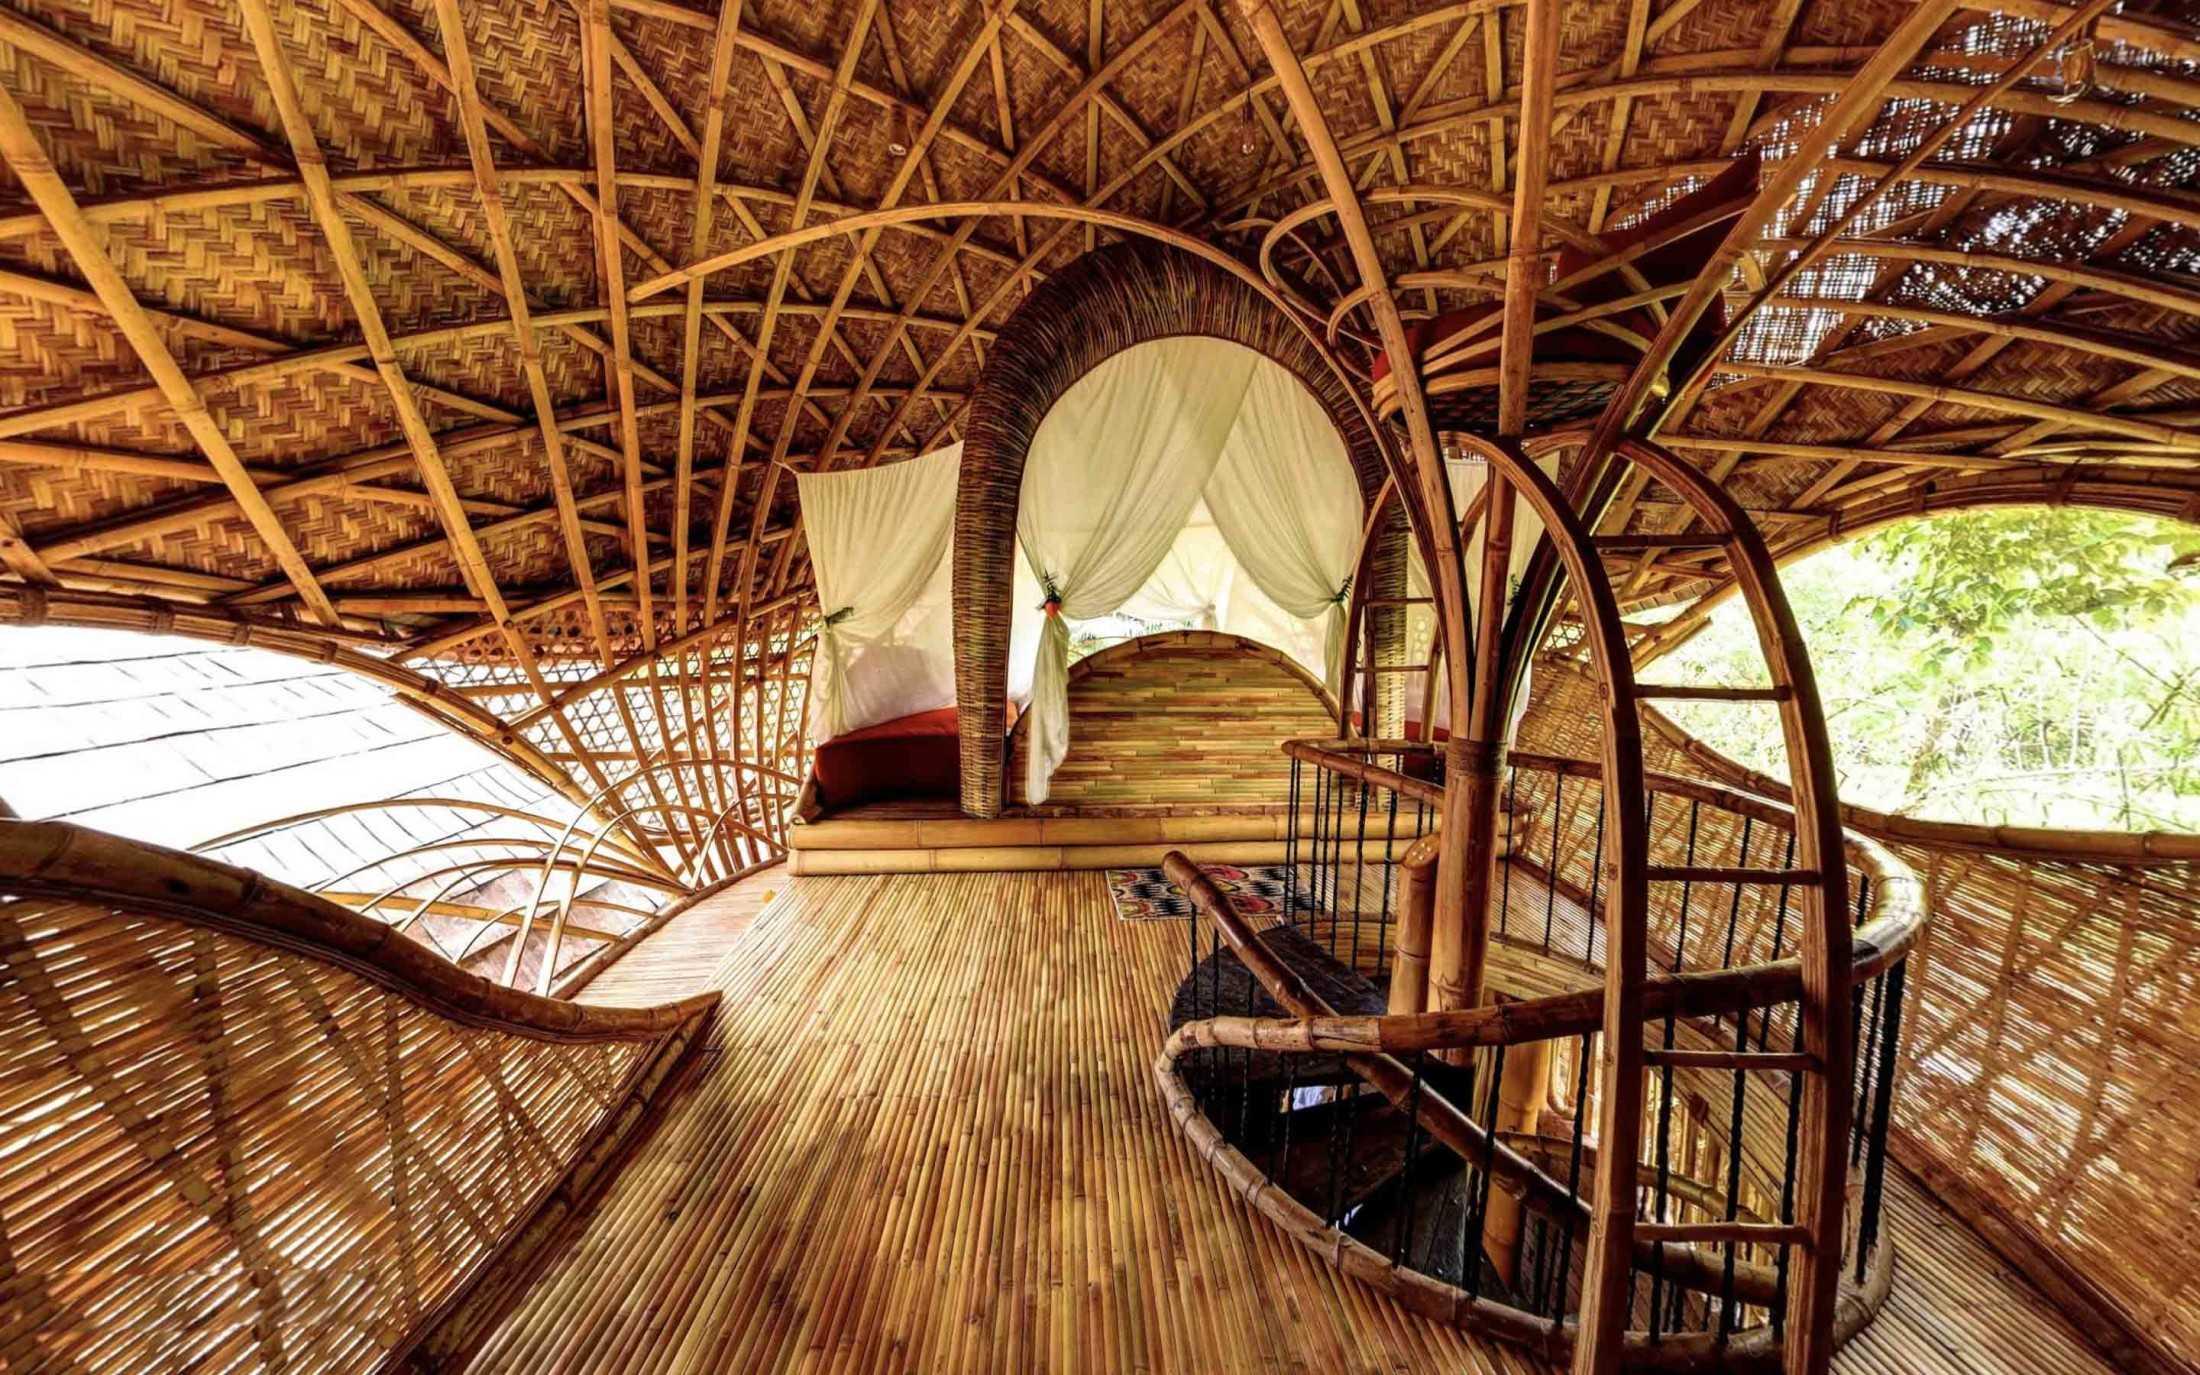 Agung Budi Raharsa | Architecture & Engineering Riverbend Bamboo House - Bali Bali, Indonesia Bali, Indonesia Agung-Budi-Raharsa-Riverbend-House-Bali  88723